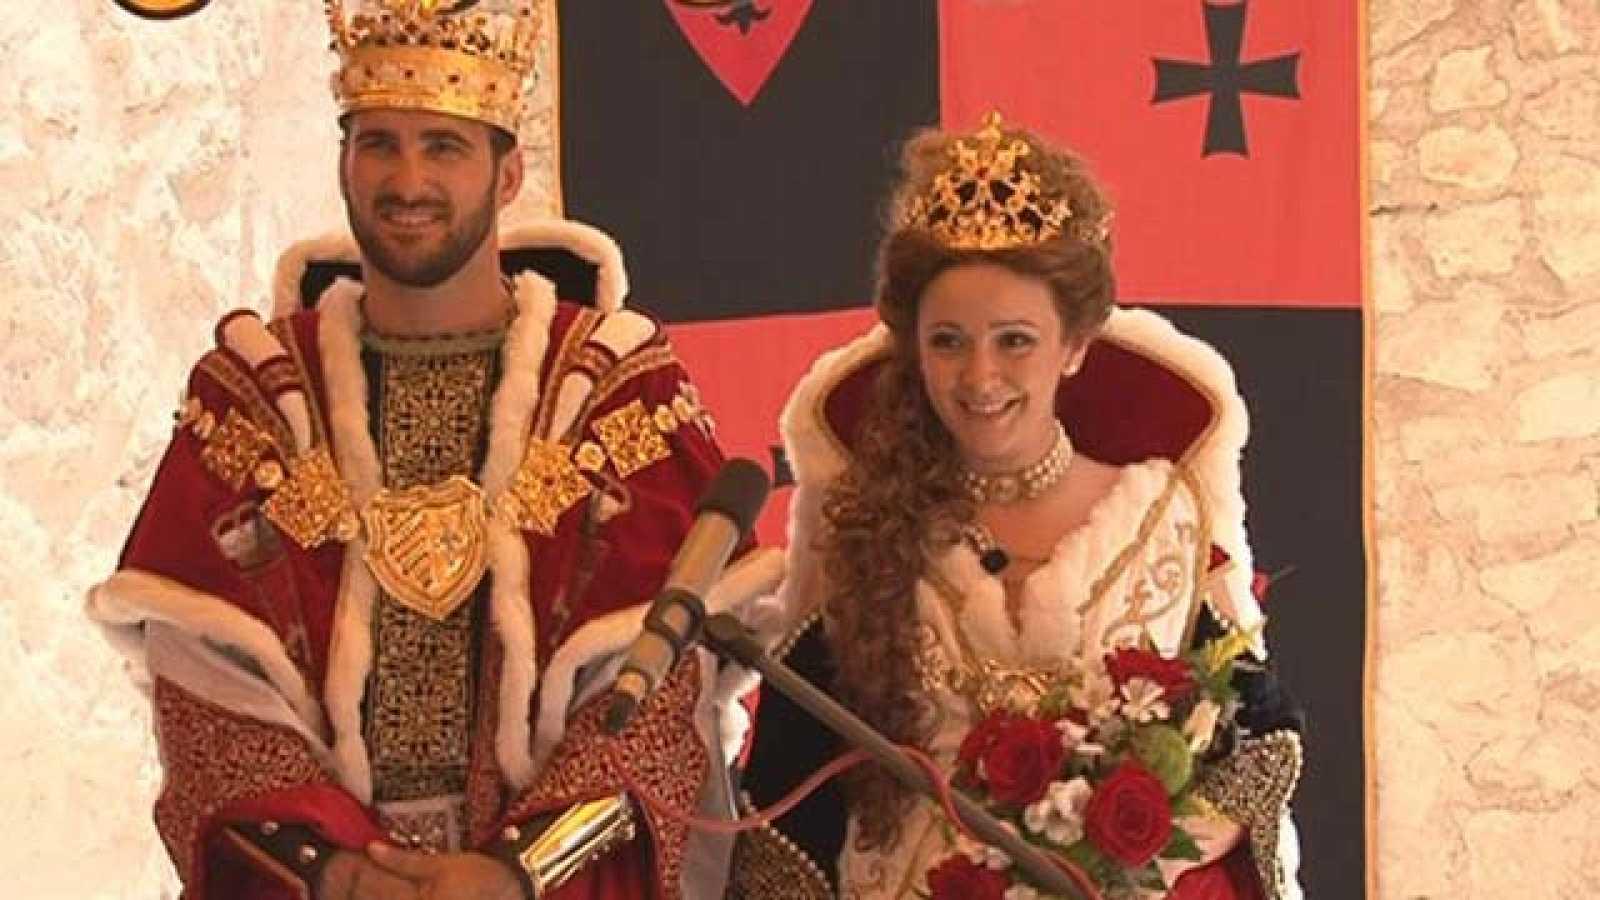 En familia - Días felices - Boda medieval